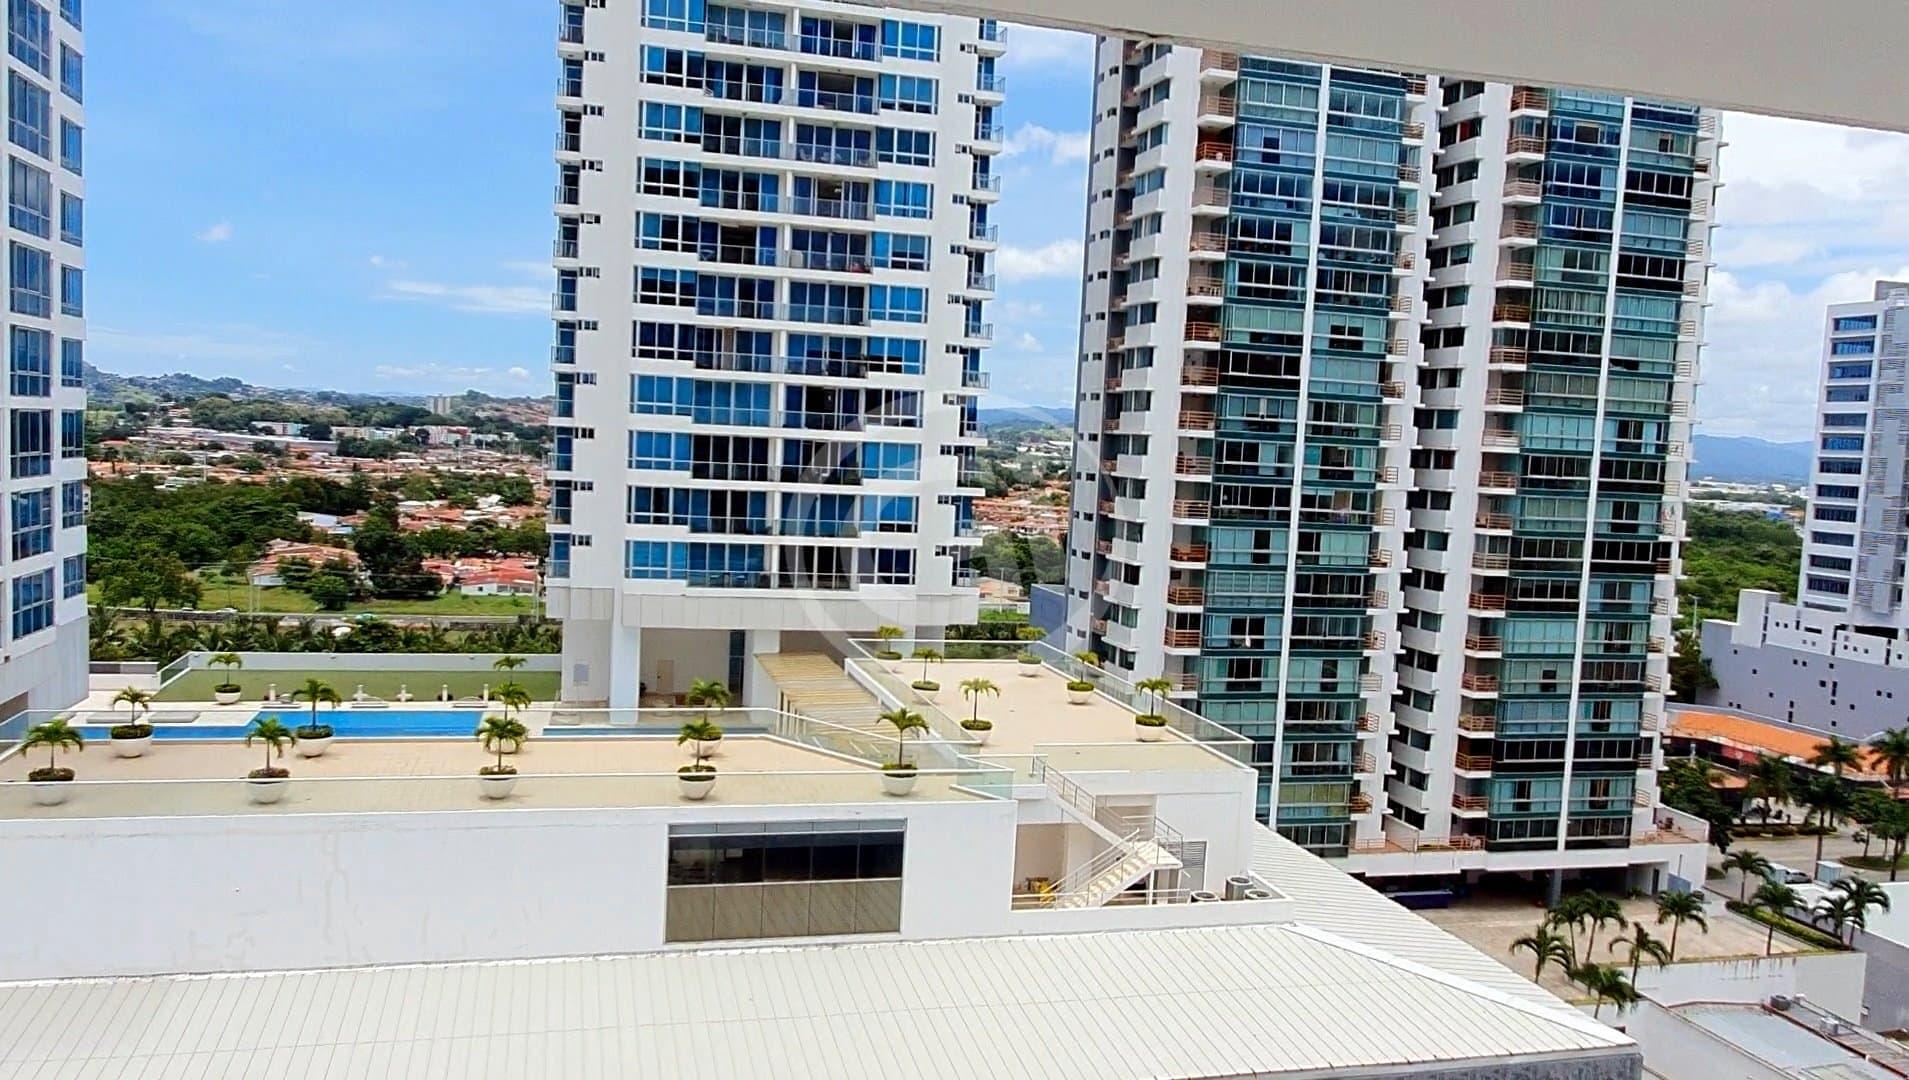 Venta Apartamento Costa del Este Pijao Mod 03 Piso Alto. Ingreso: $3,400